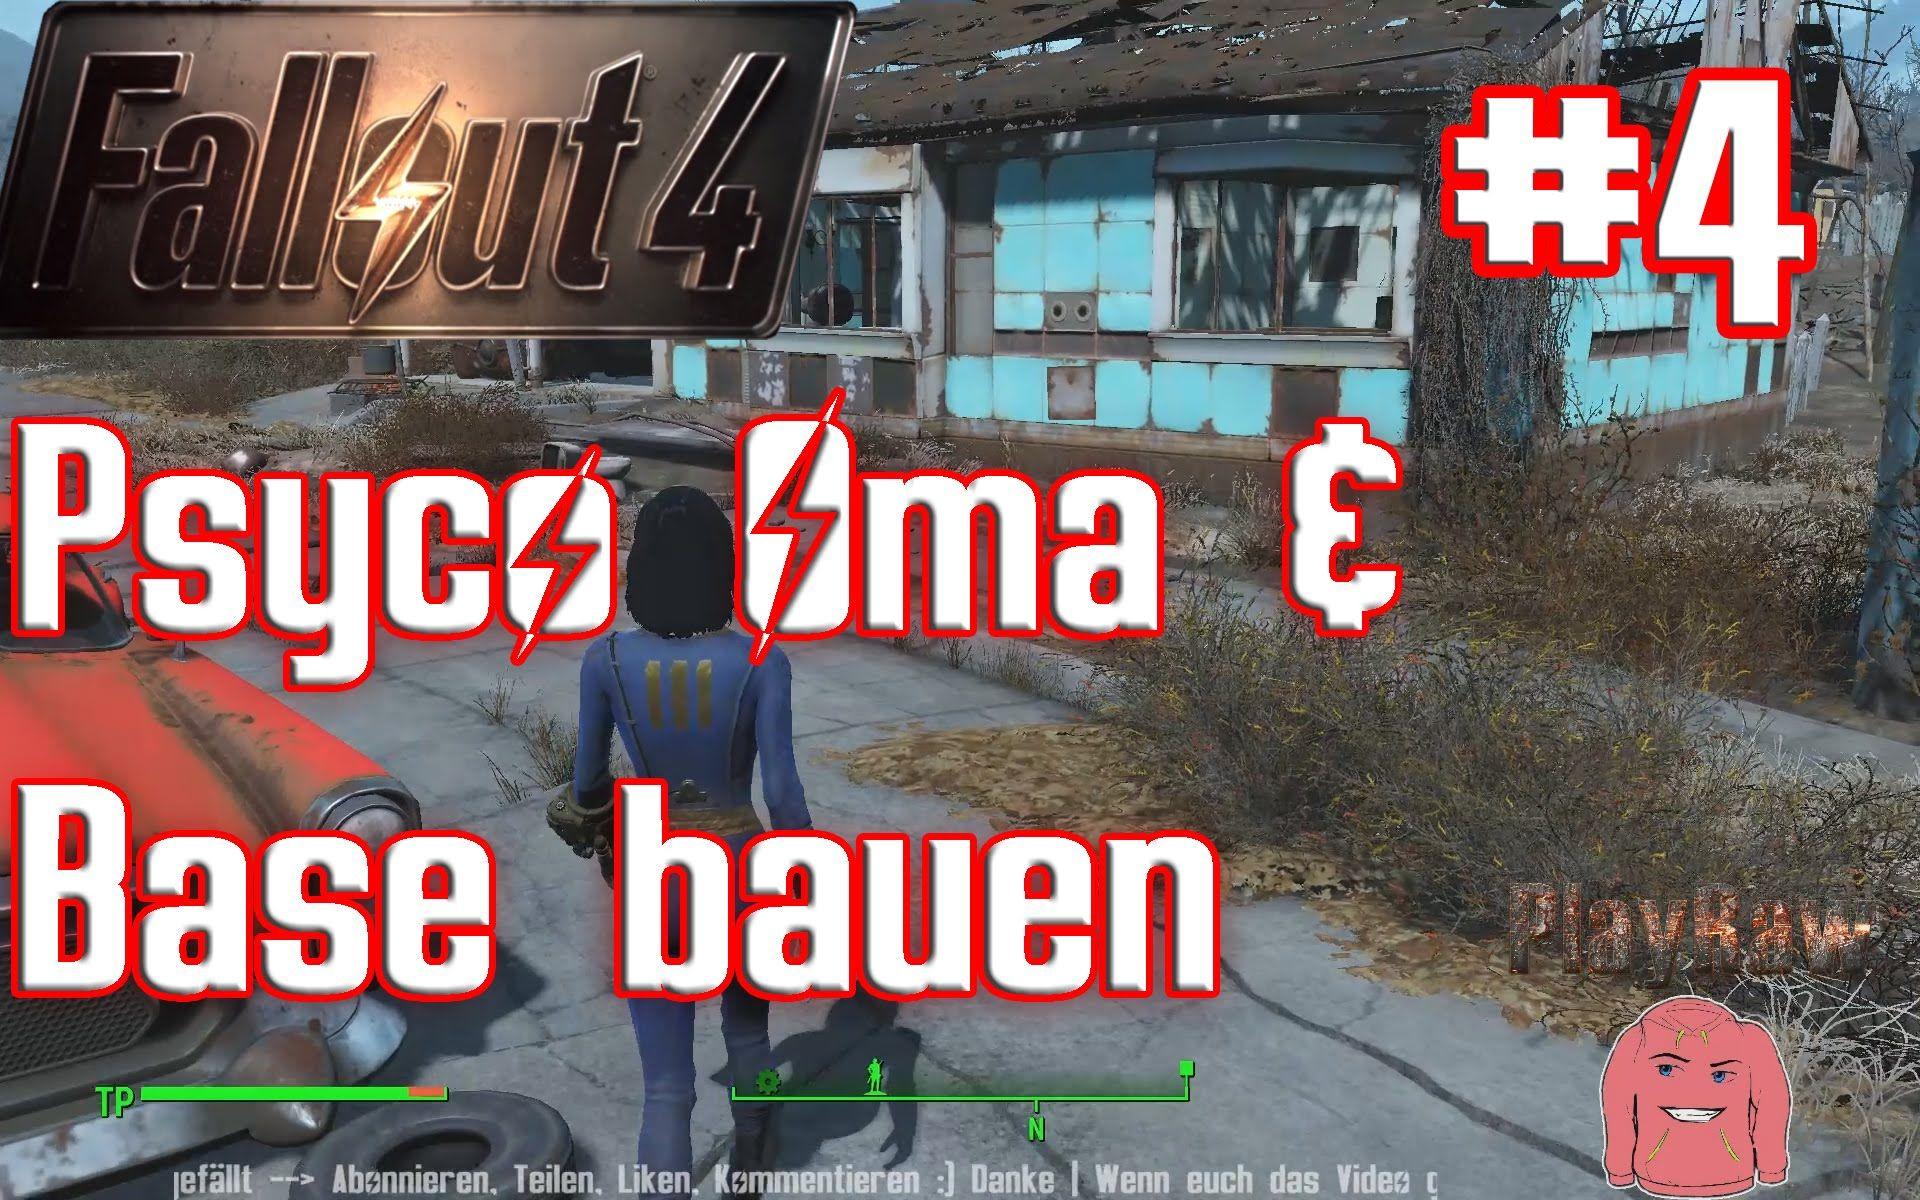 Fallout 4 Play Raw #4 Psyco Oma & Base bauen Gameplay German Deutsch Let...